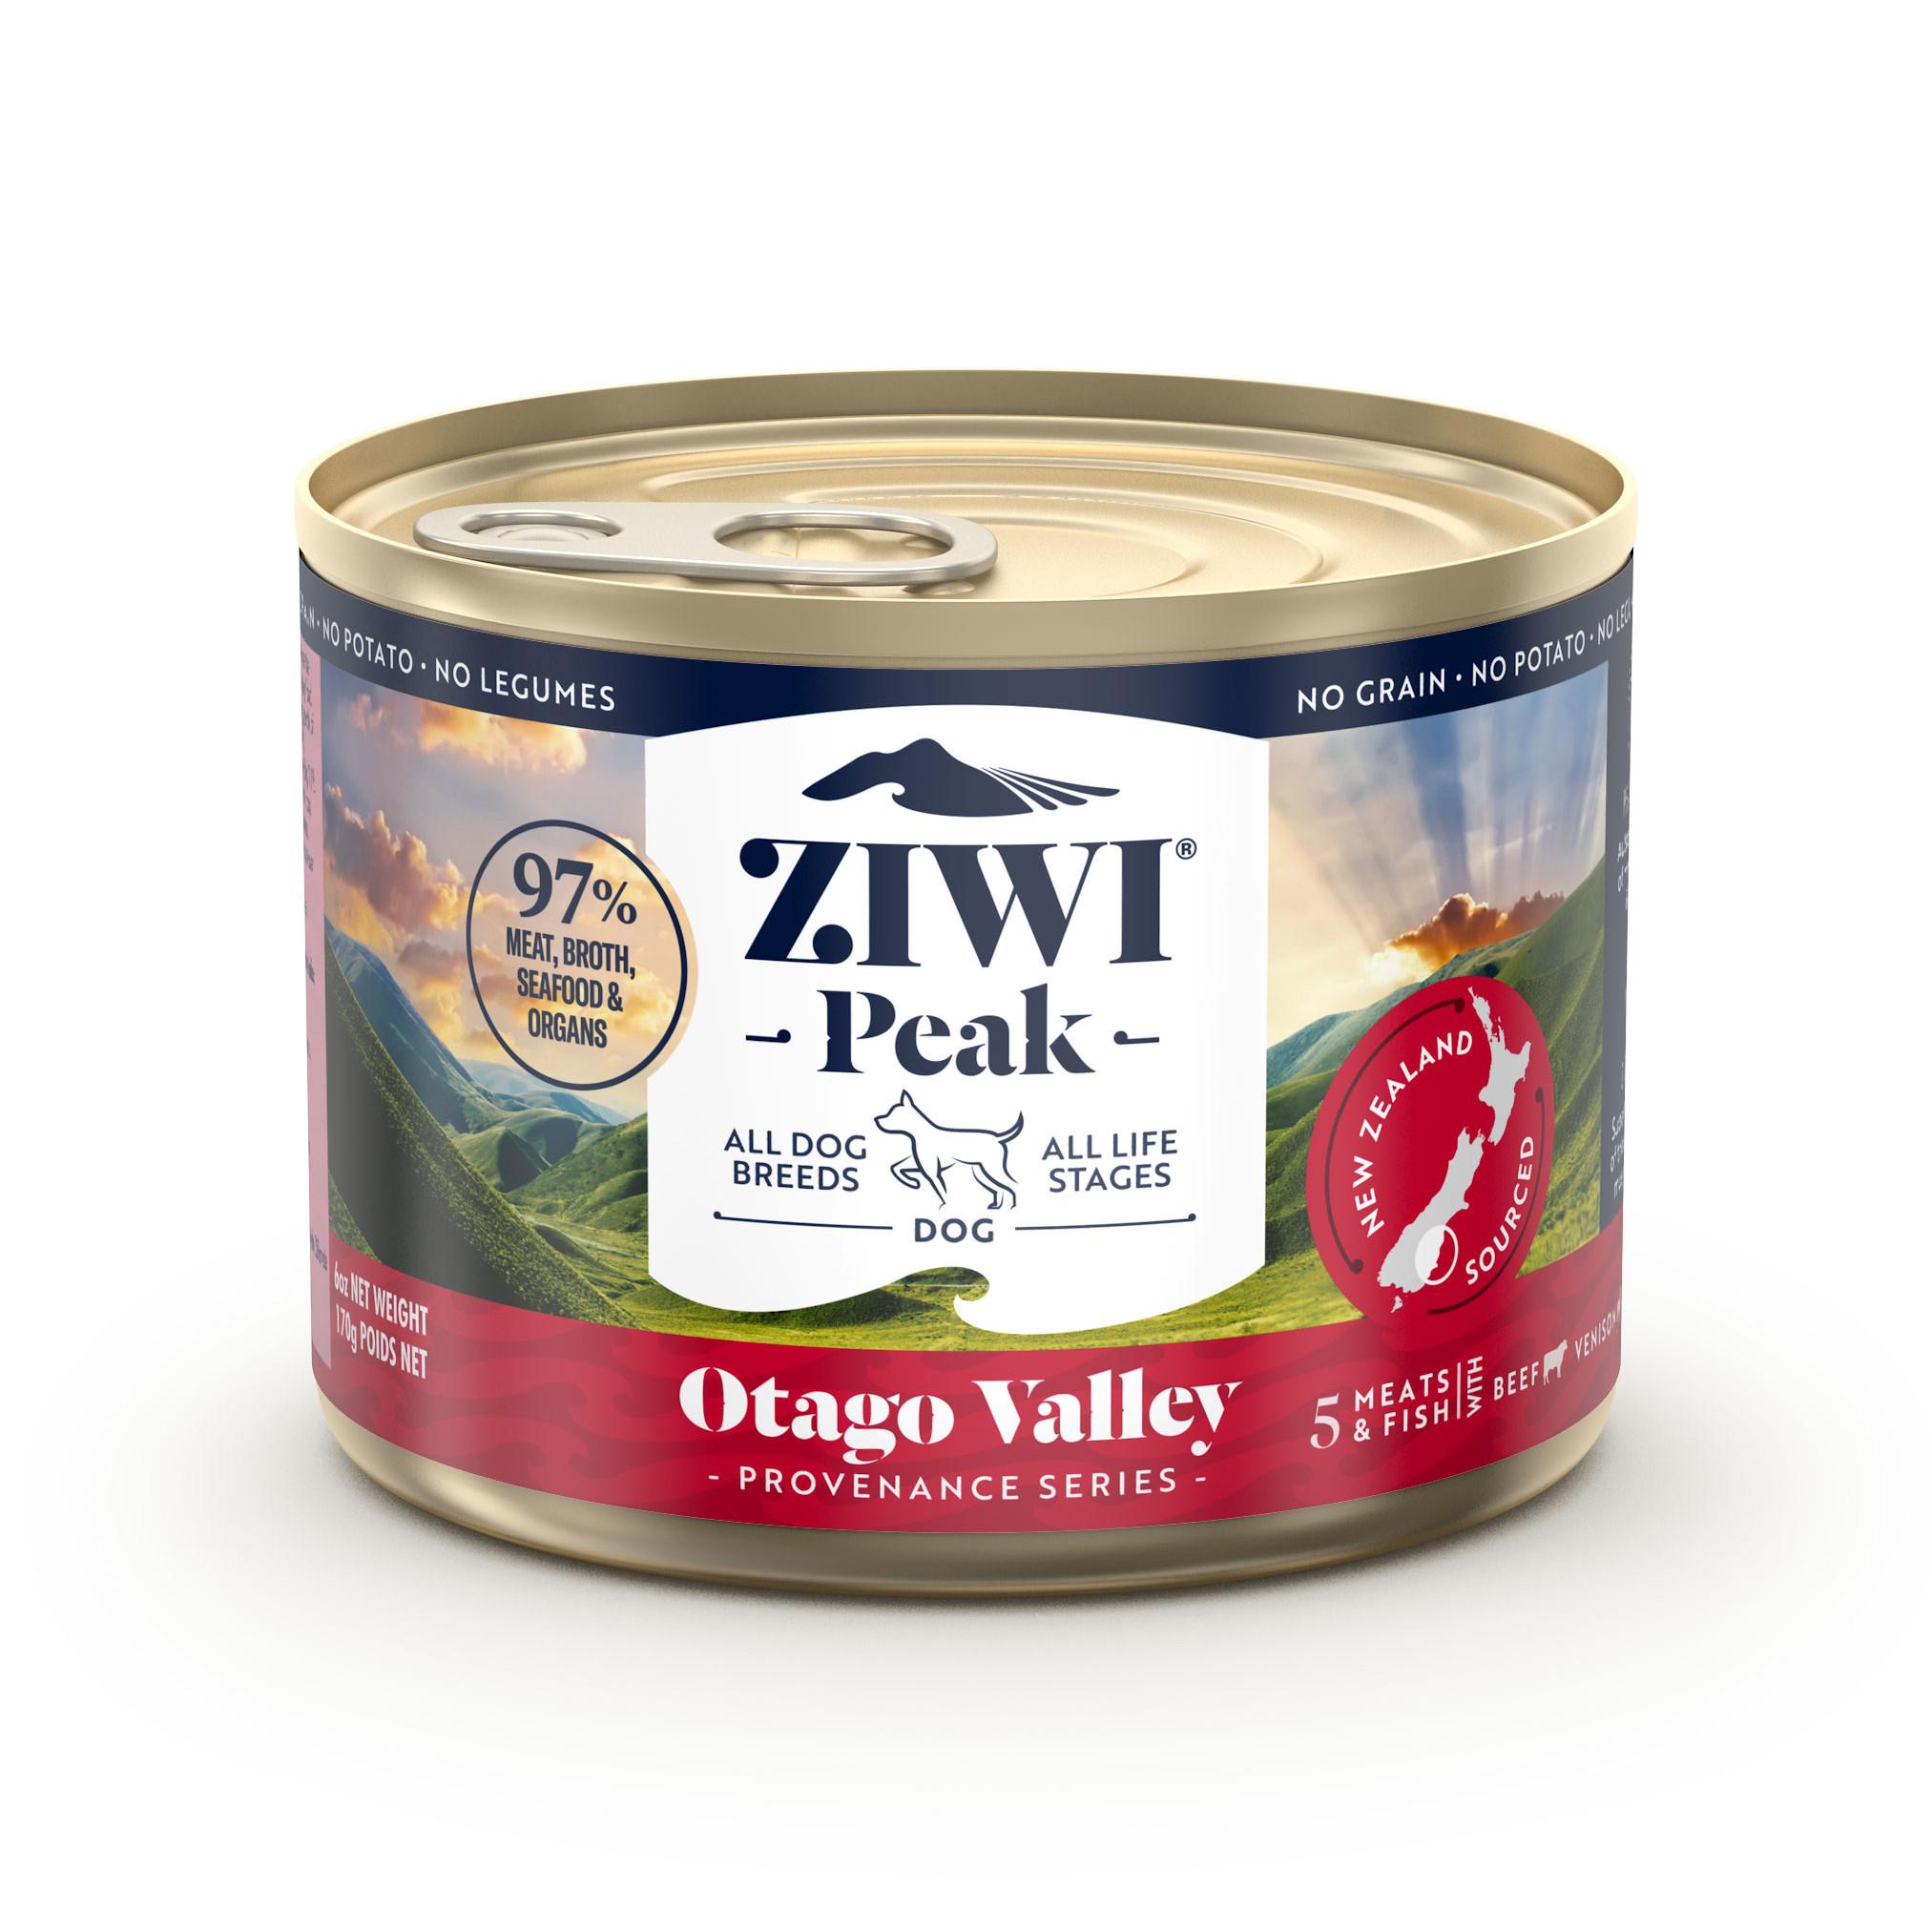 ZIWI Peak Provenance Canned Dog Food Otago Valley Recipe, 6-oz|170-g